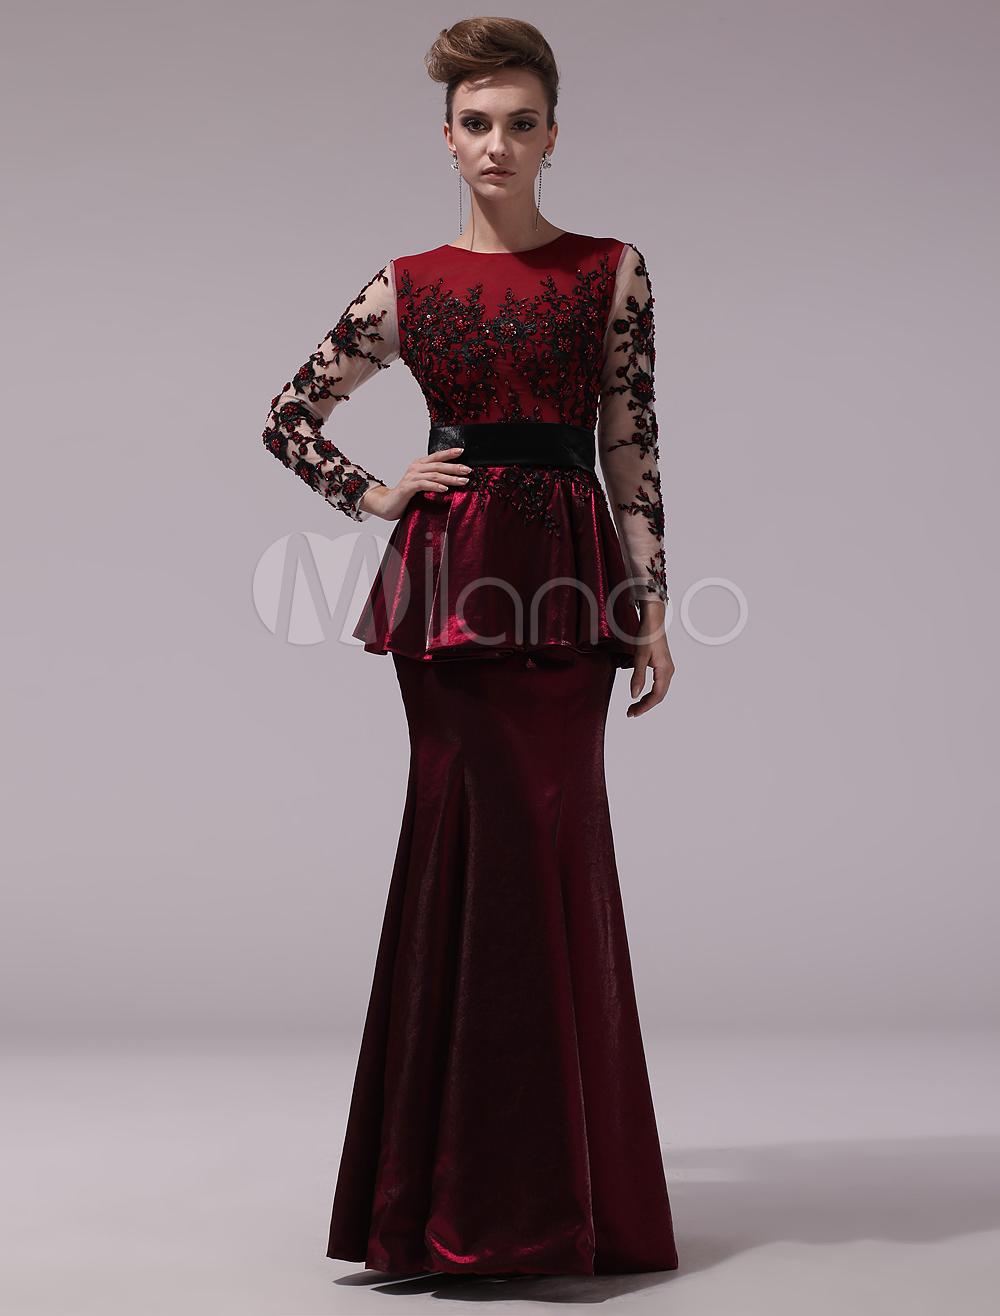 Burgundy Peplum Jewel Neck Long Sleeves Mermaid Evening Dress Milanoo (Wedding Evening Dresses) photo